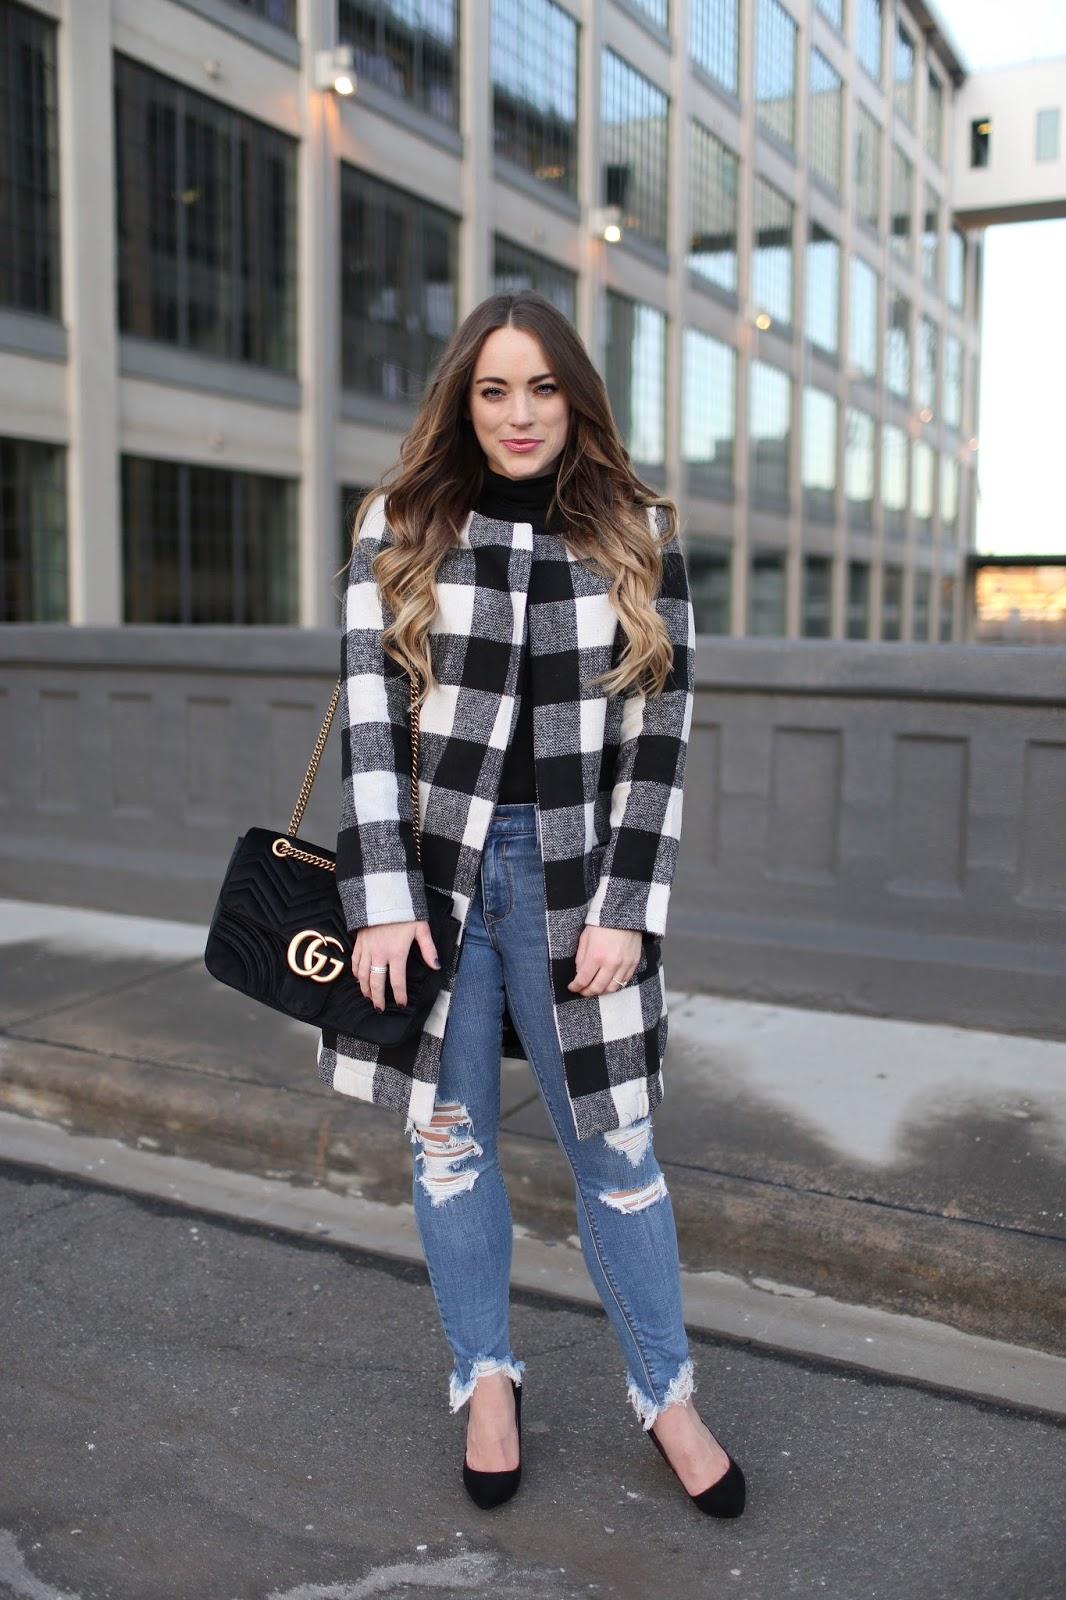 Street Style Checkered Jacket